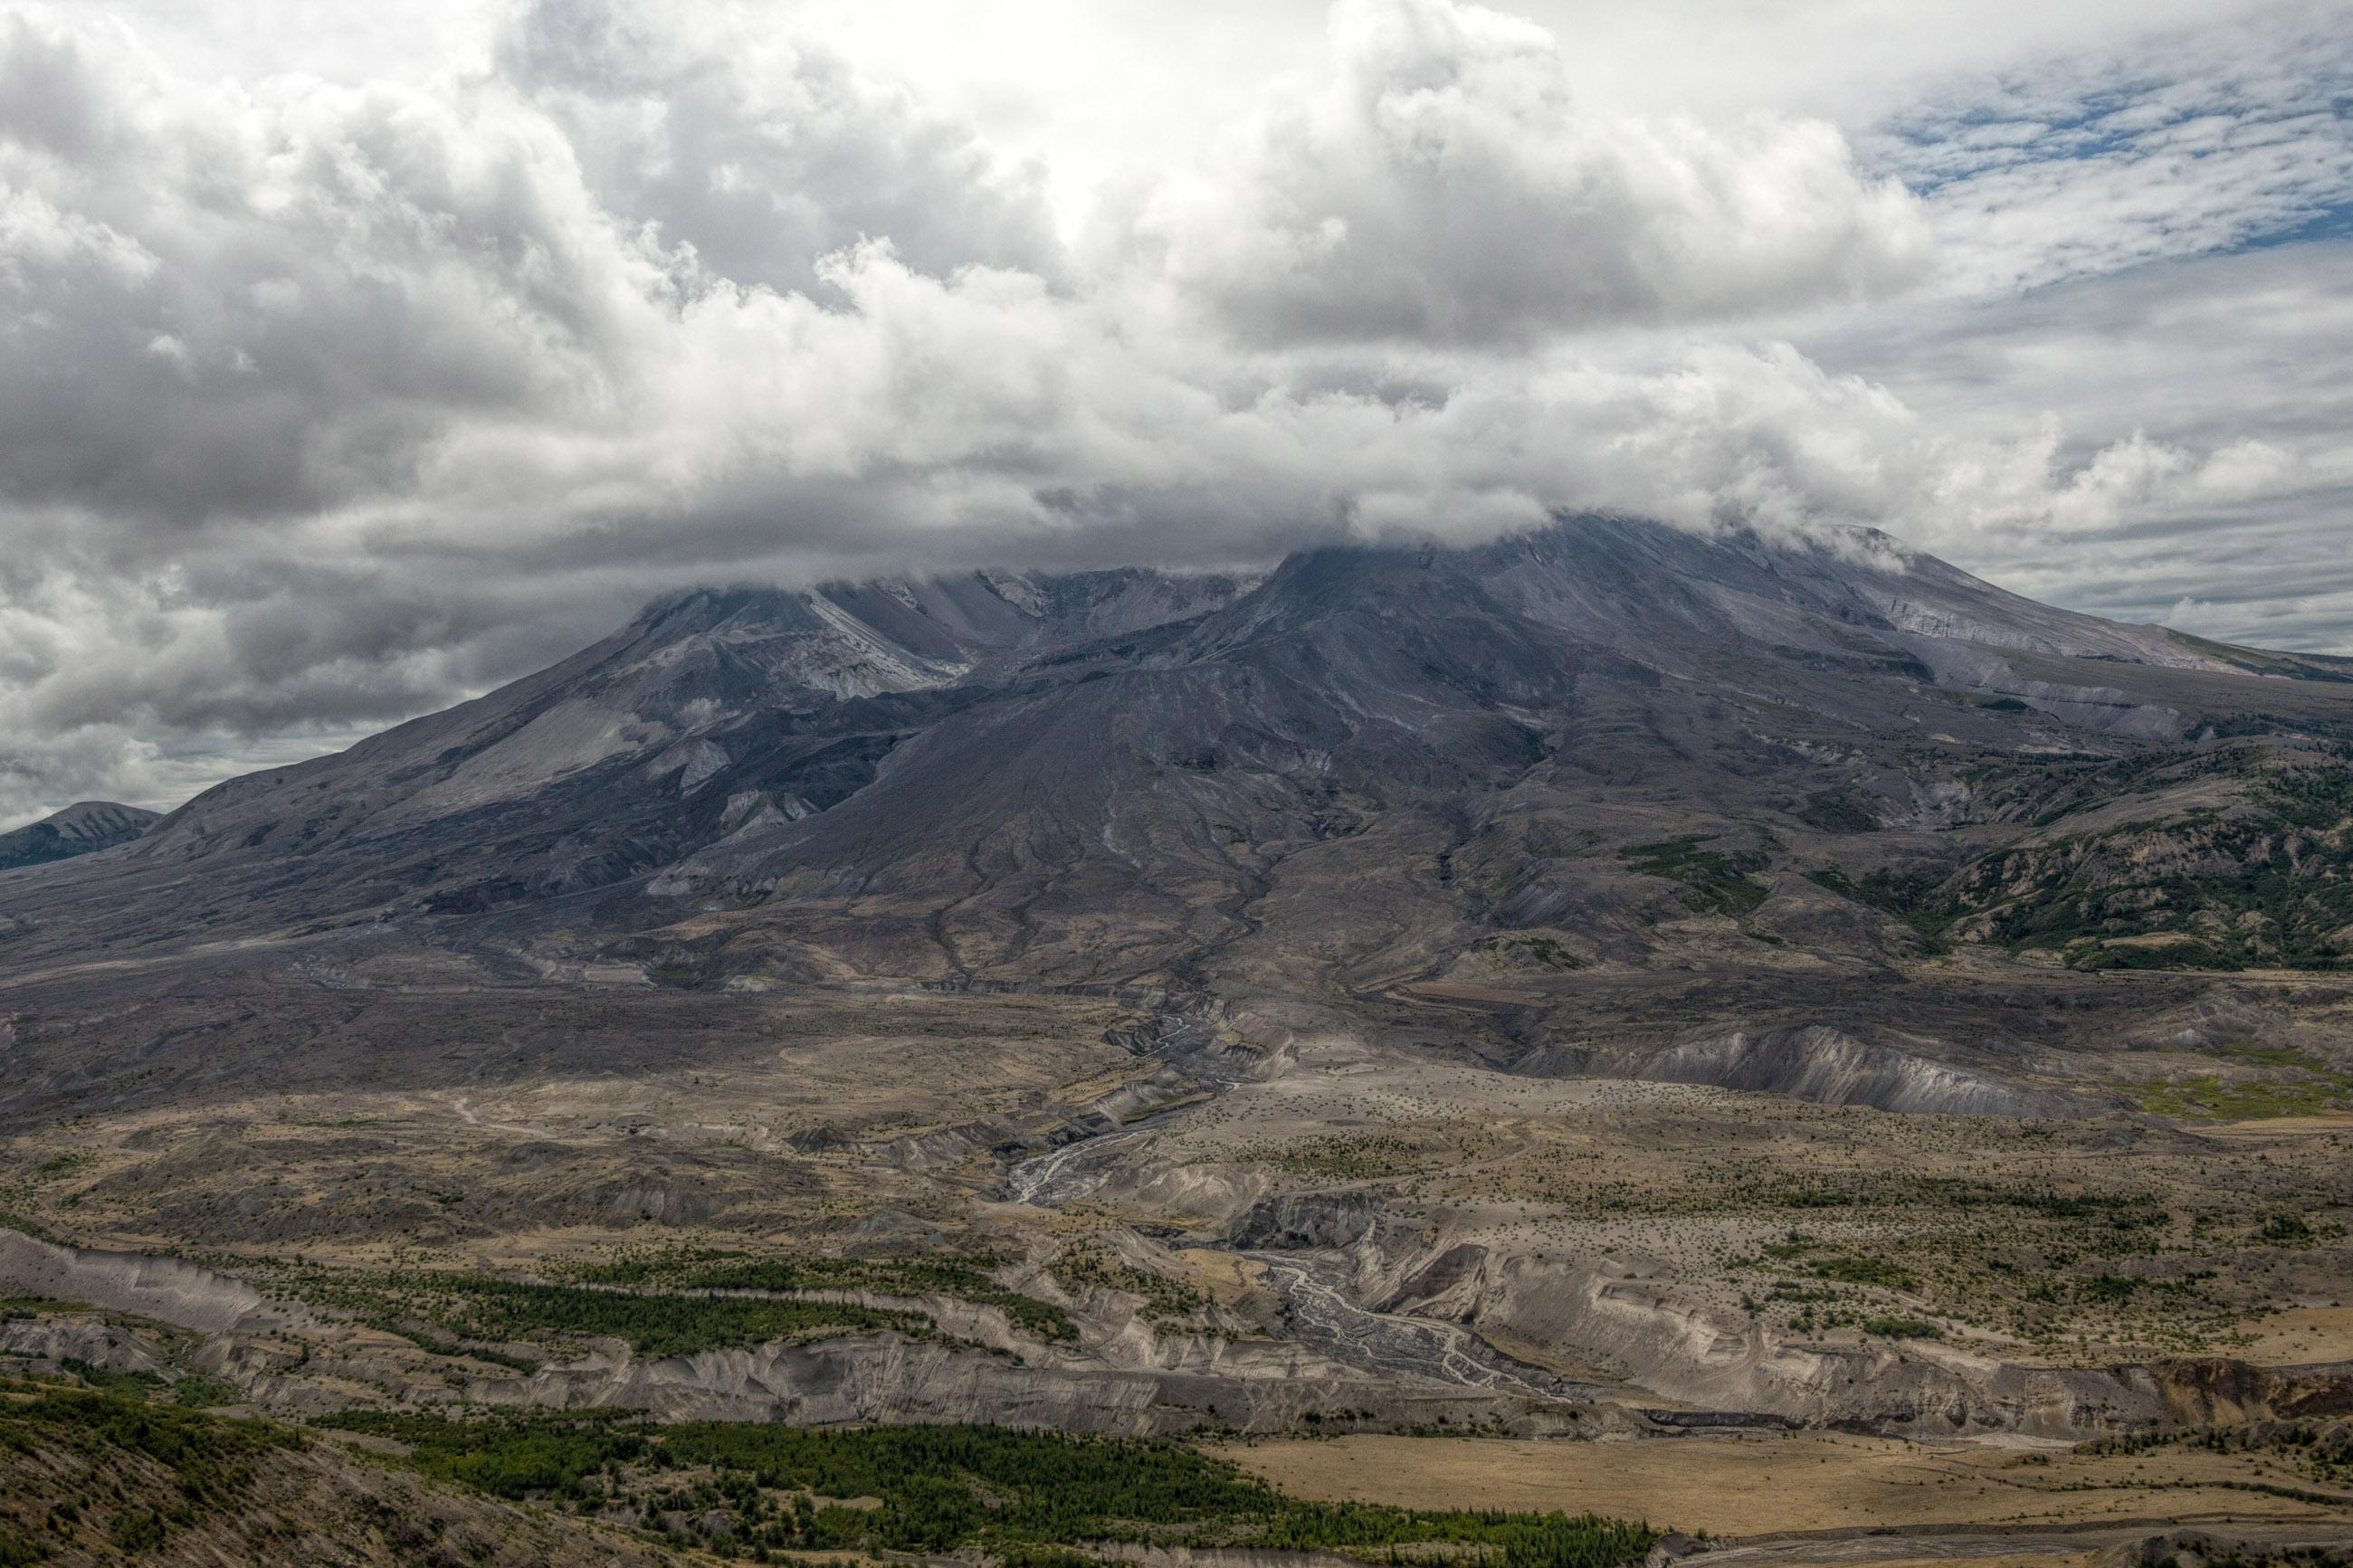 Mt st helens photo